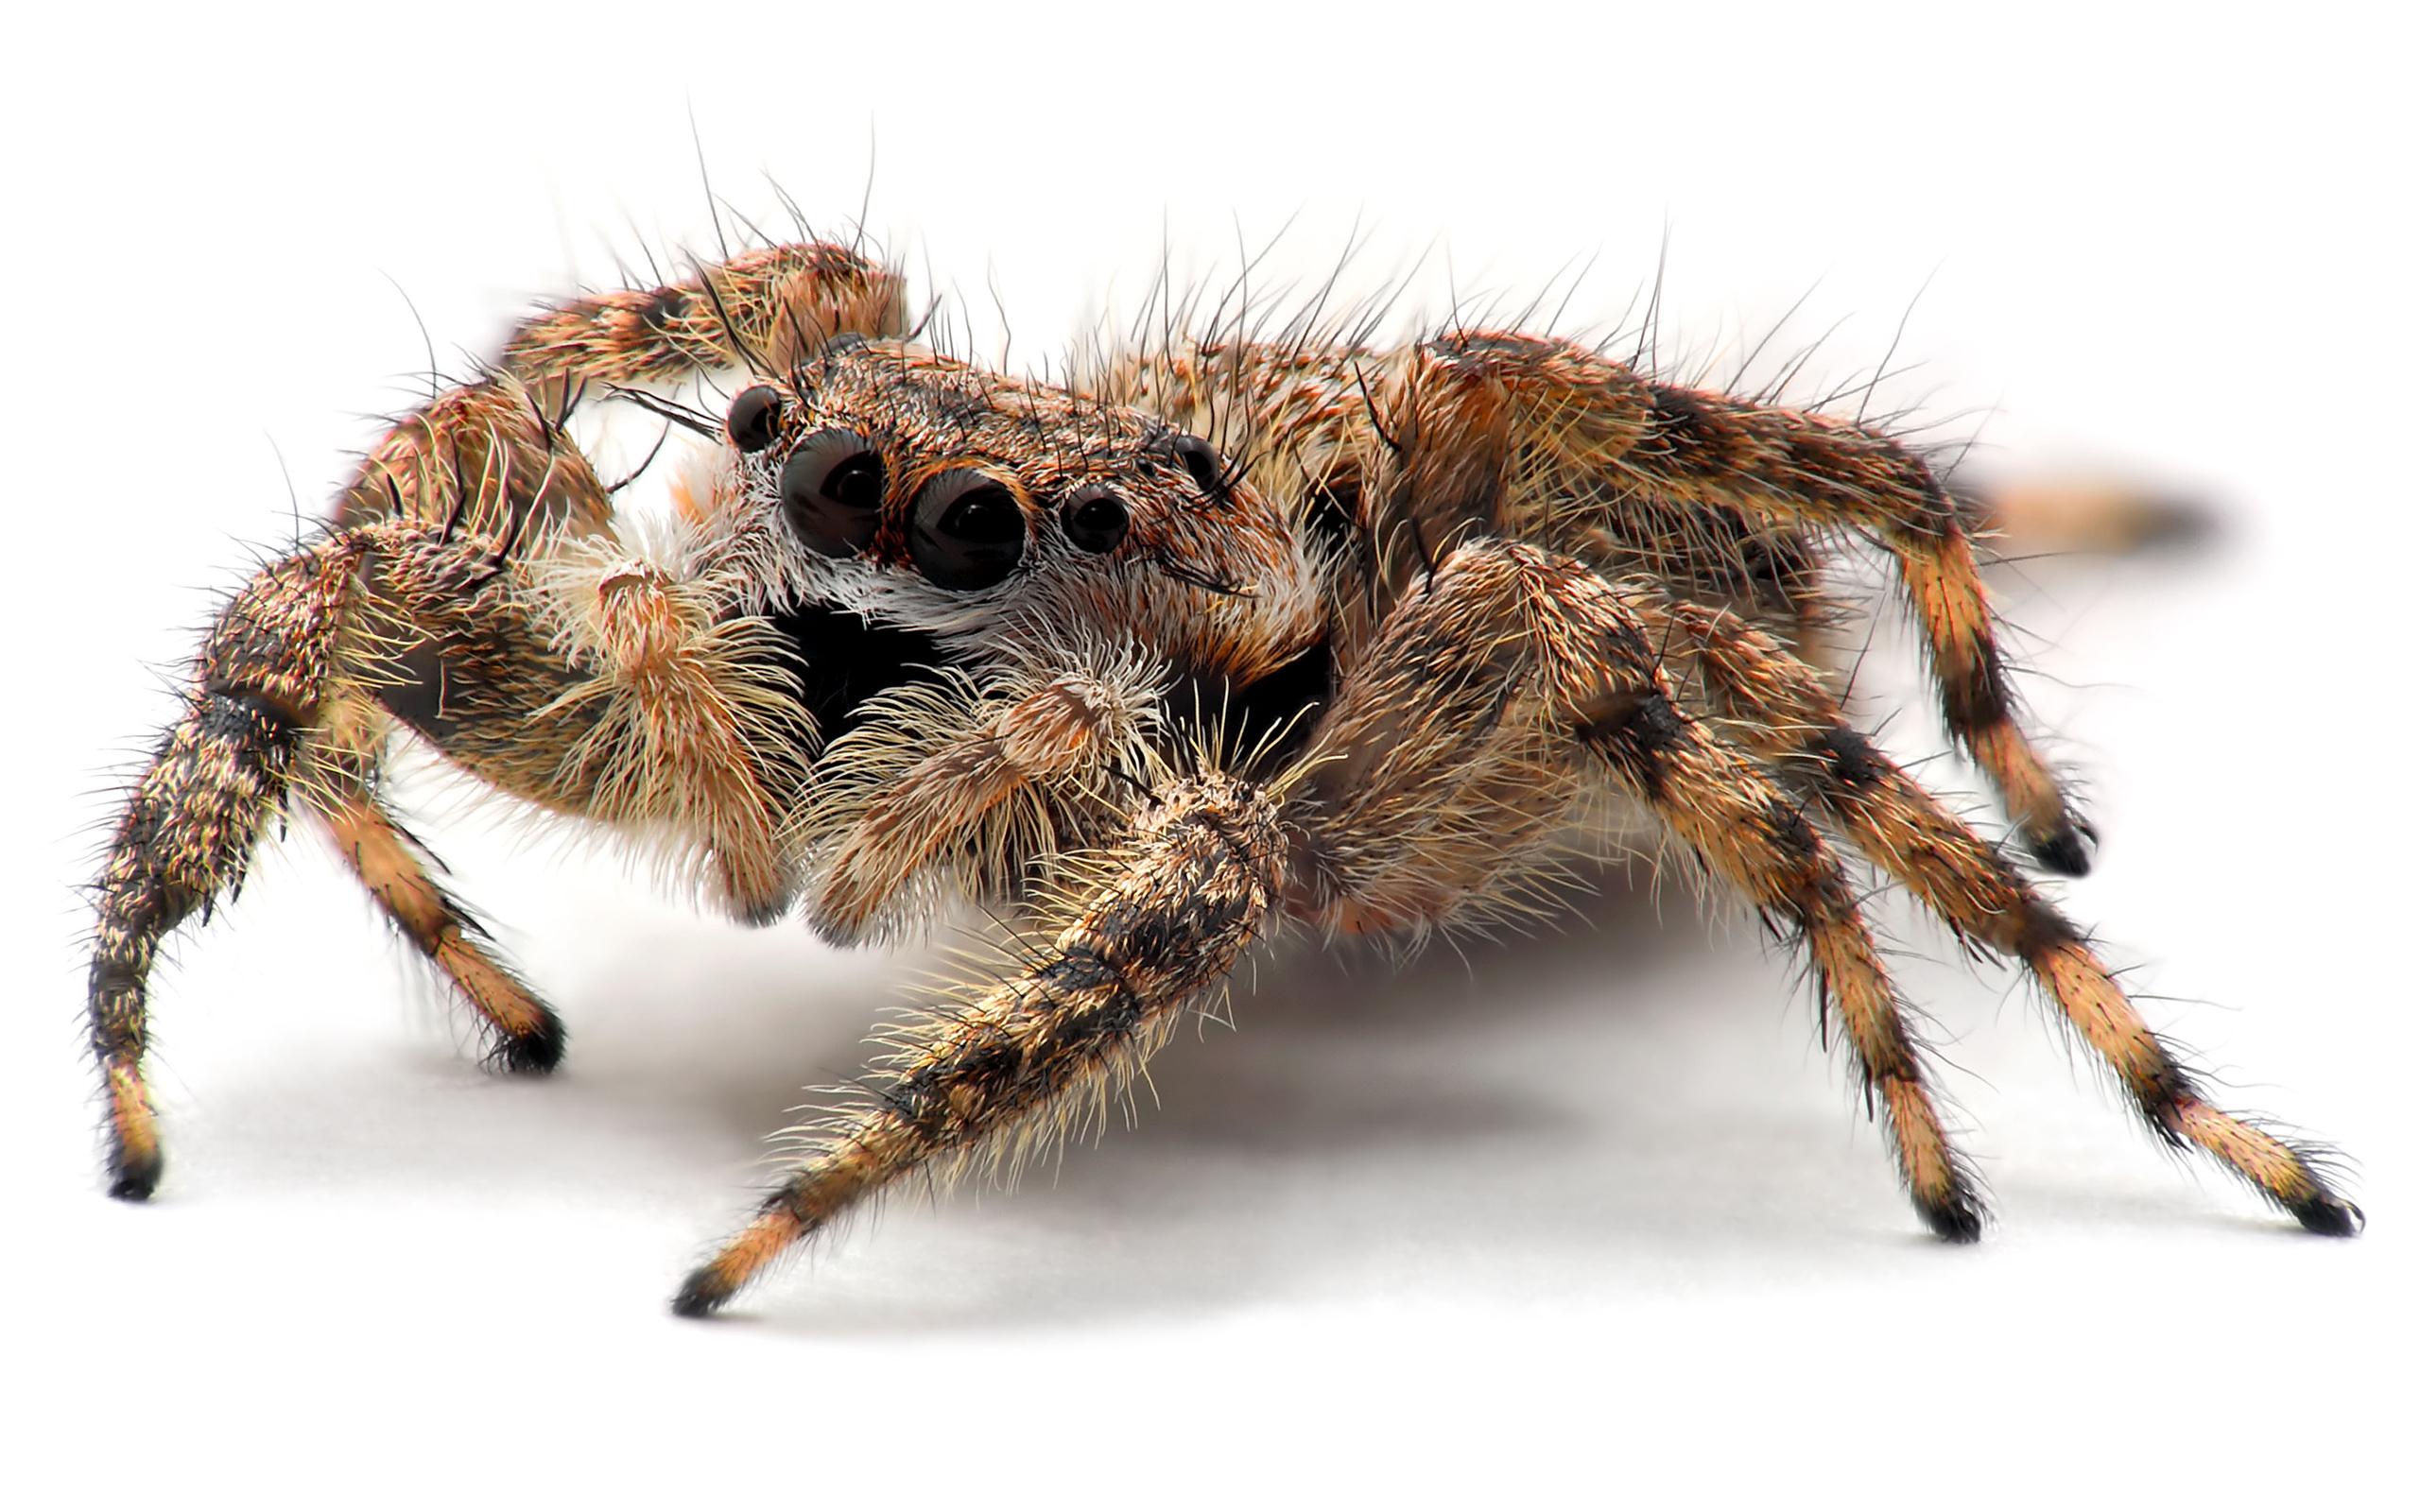 Big Creepy Hairy Spider | ANIMAL